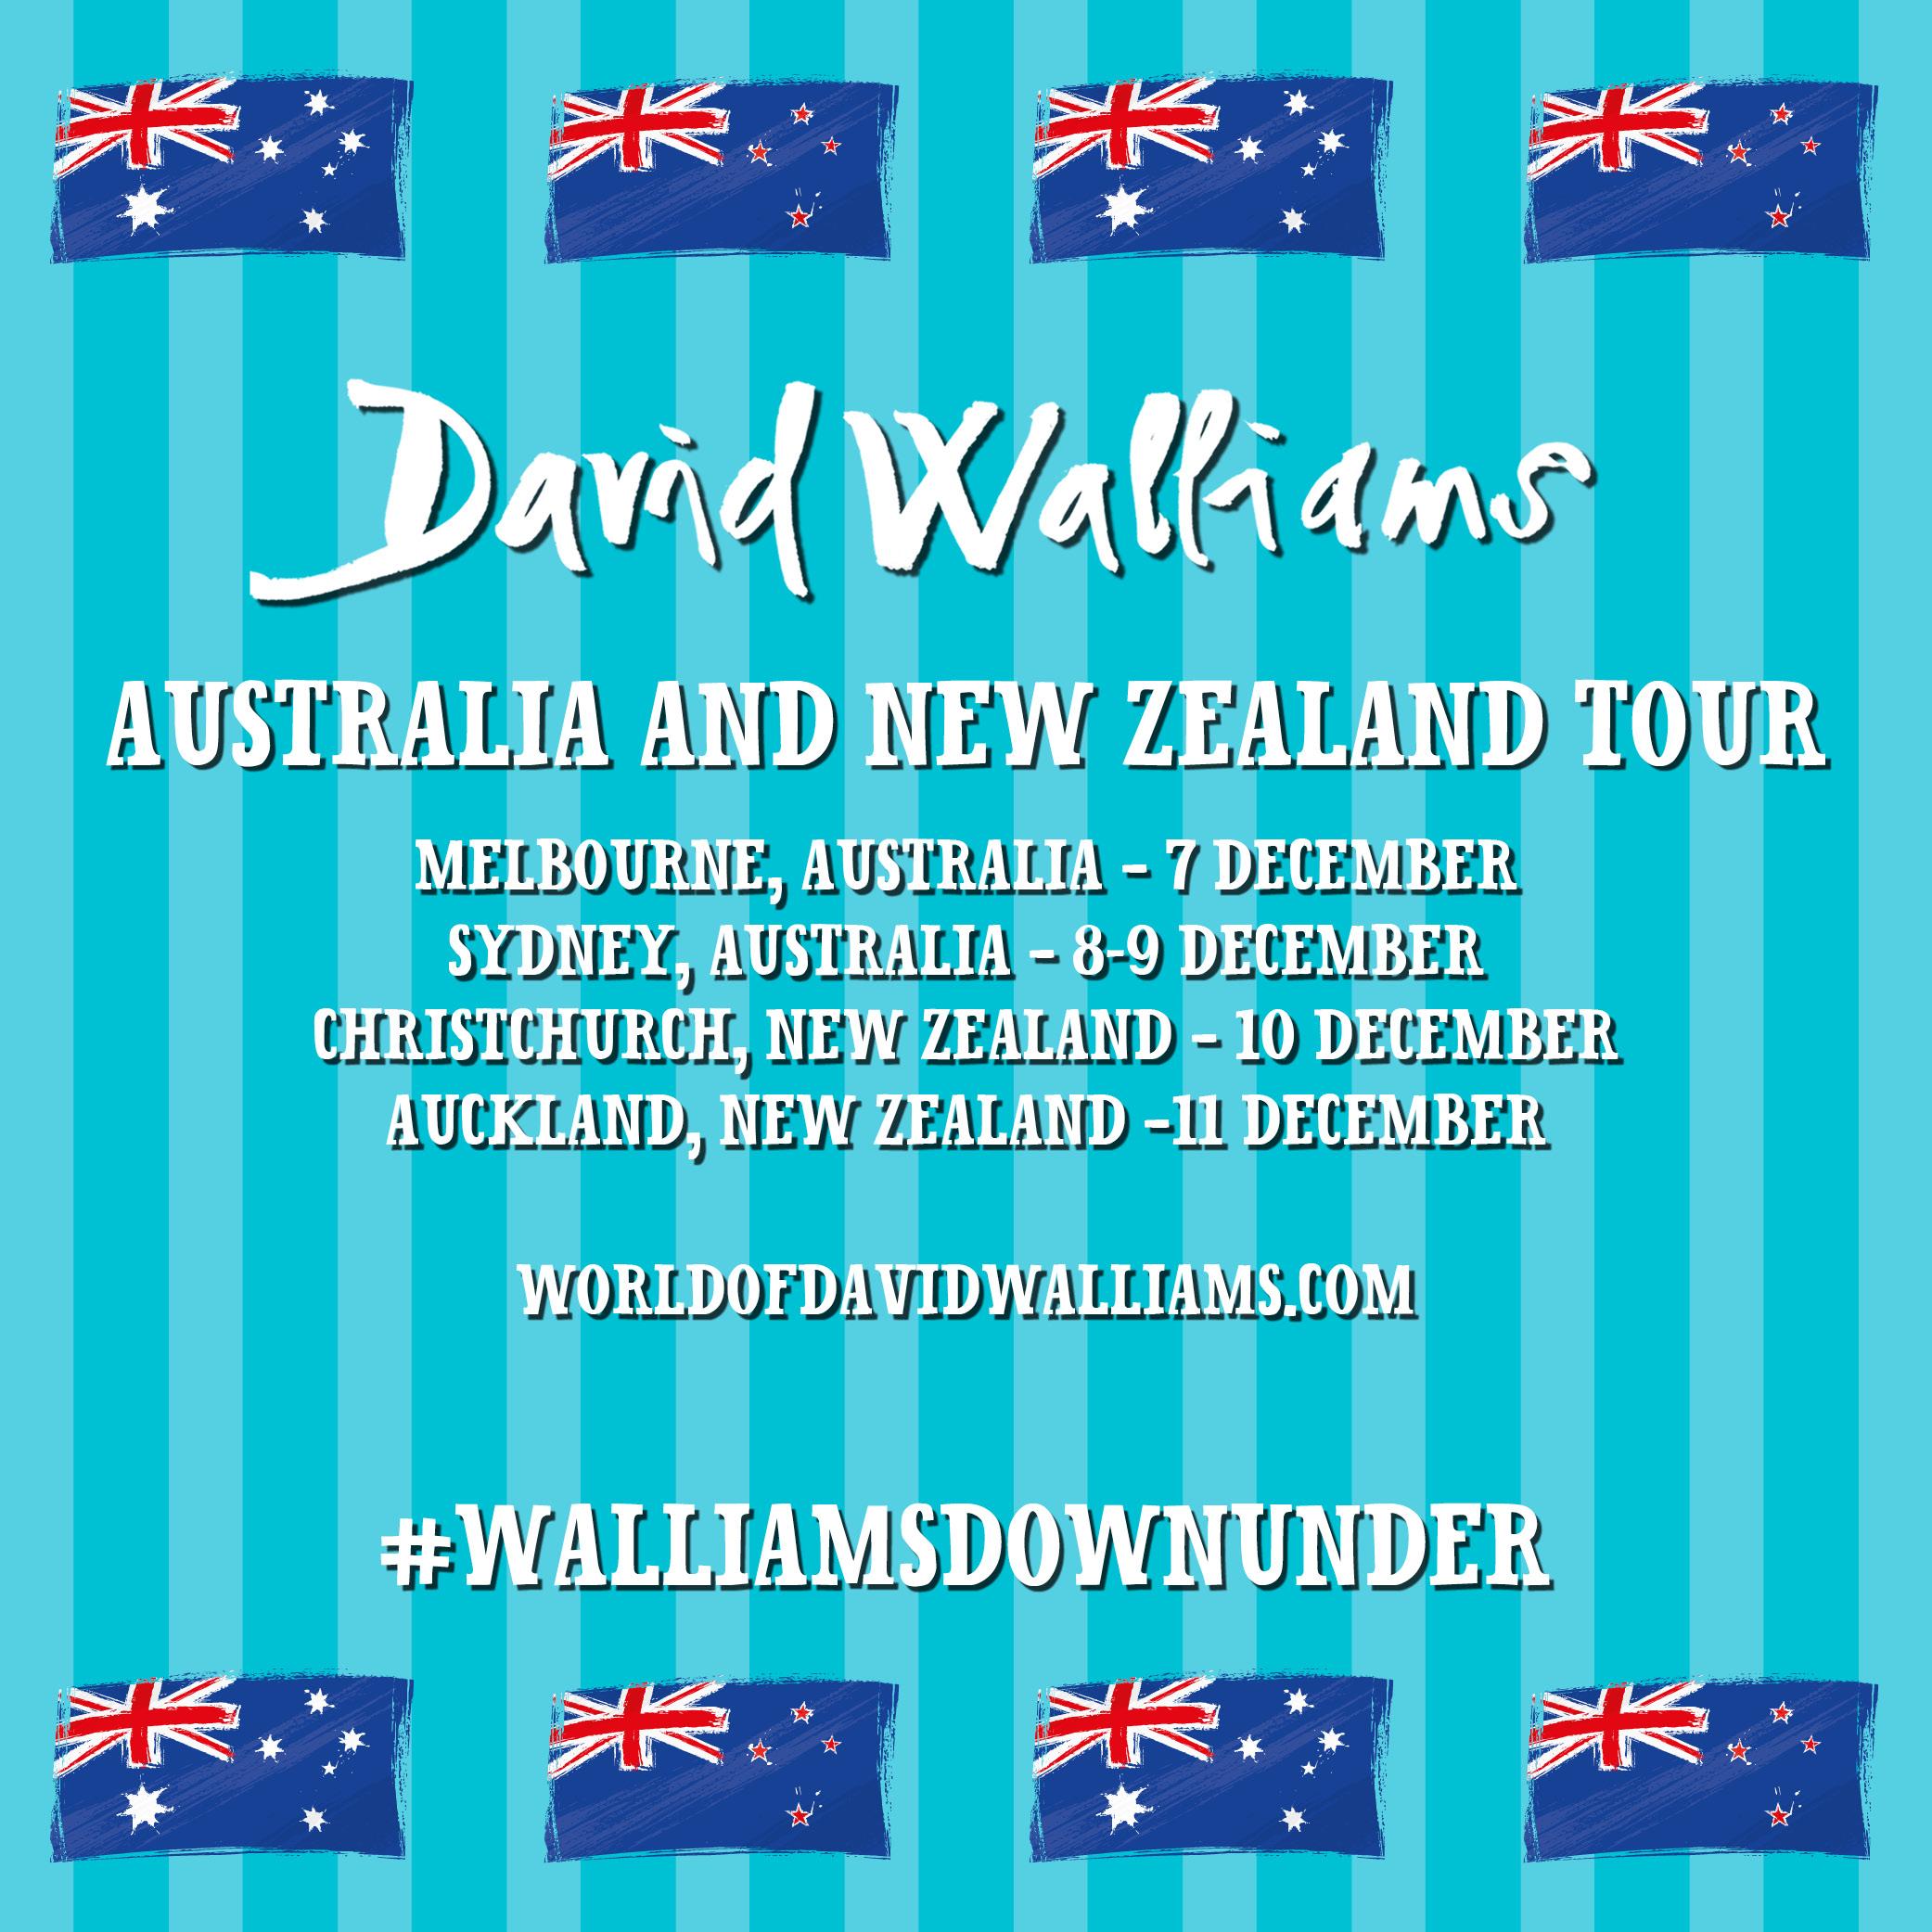 David Walliams to visit Australia and New Zealand!